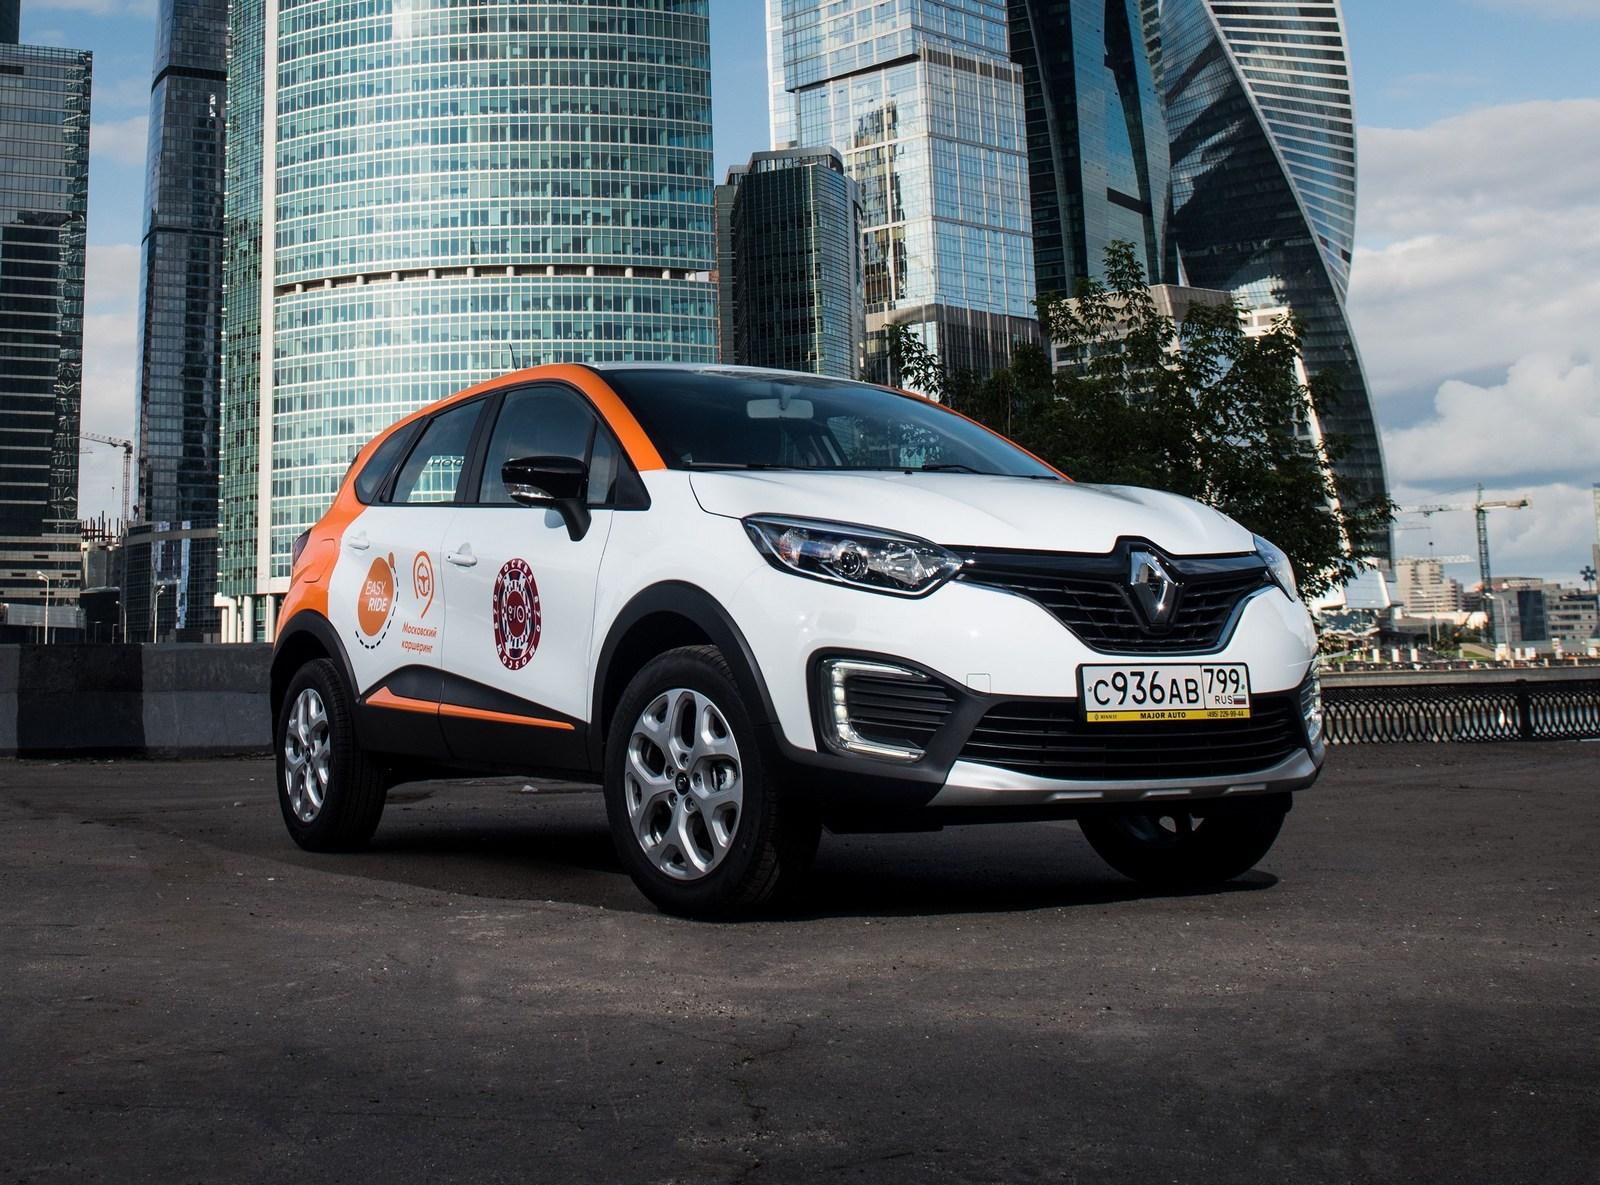 Renault Captur Easy Ride